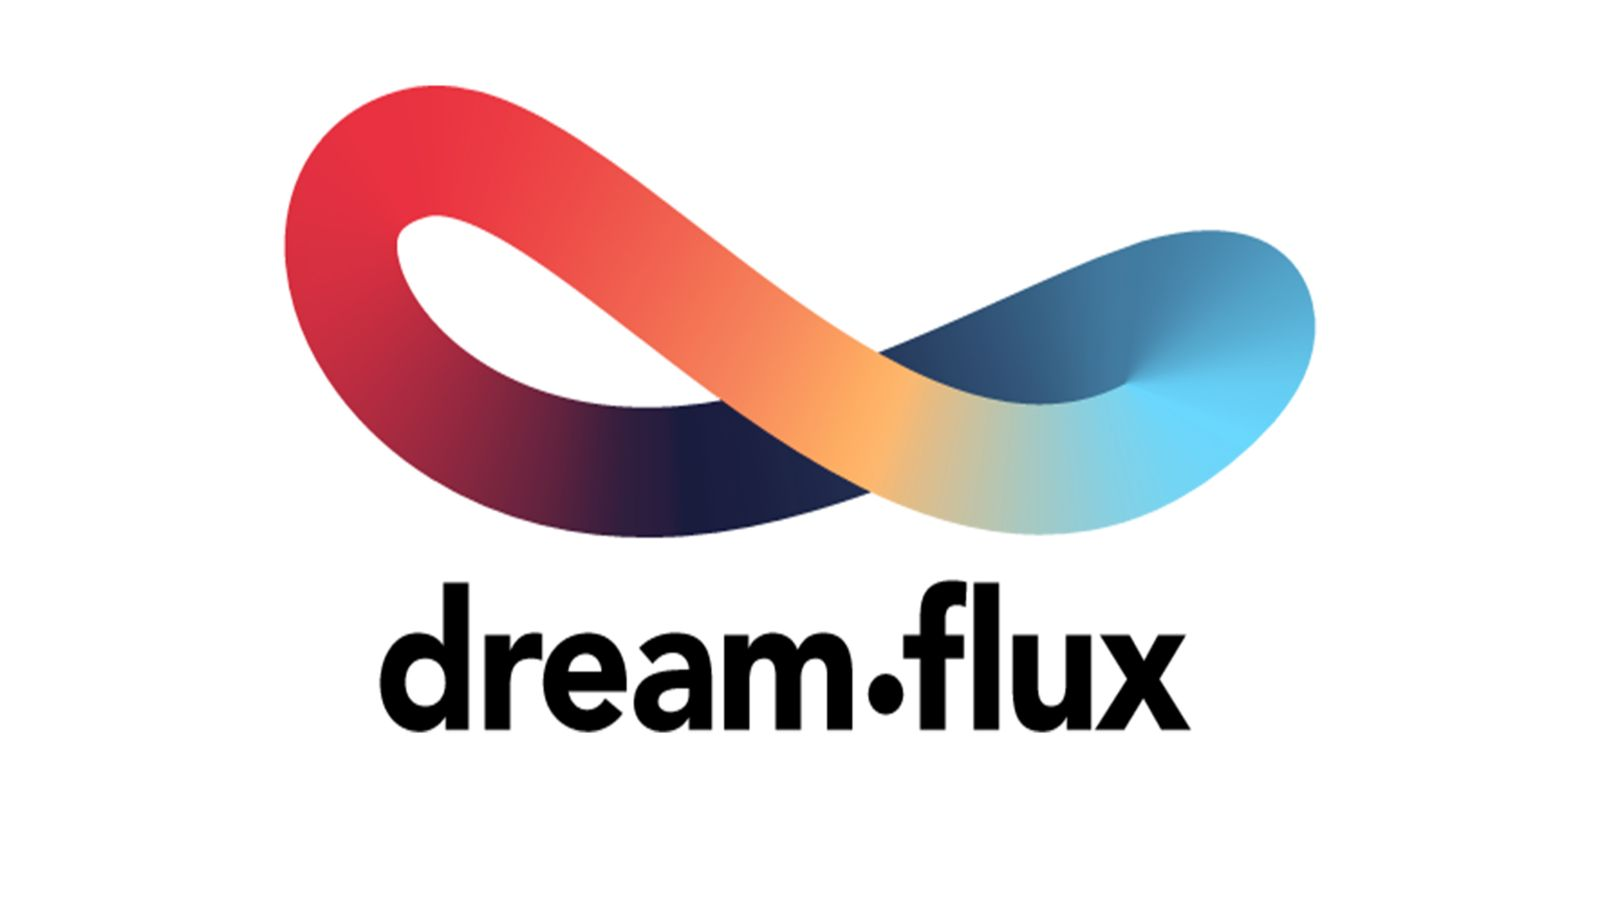 DreamFlux logo